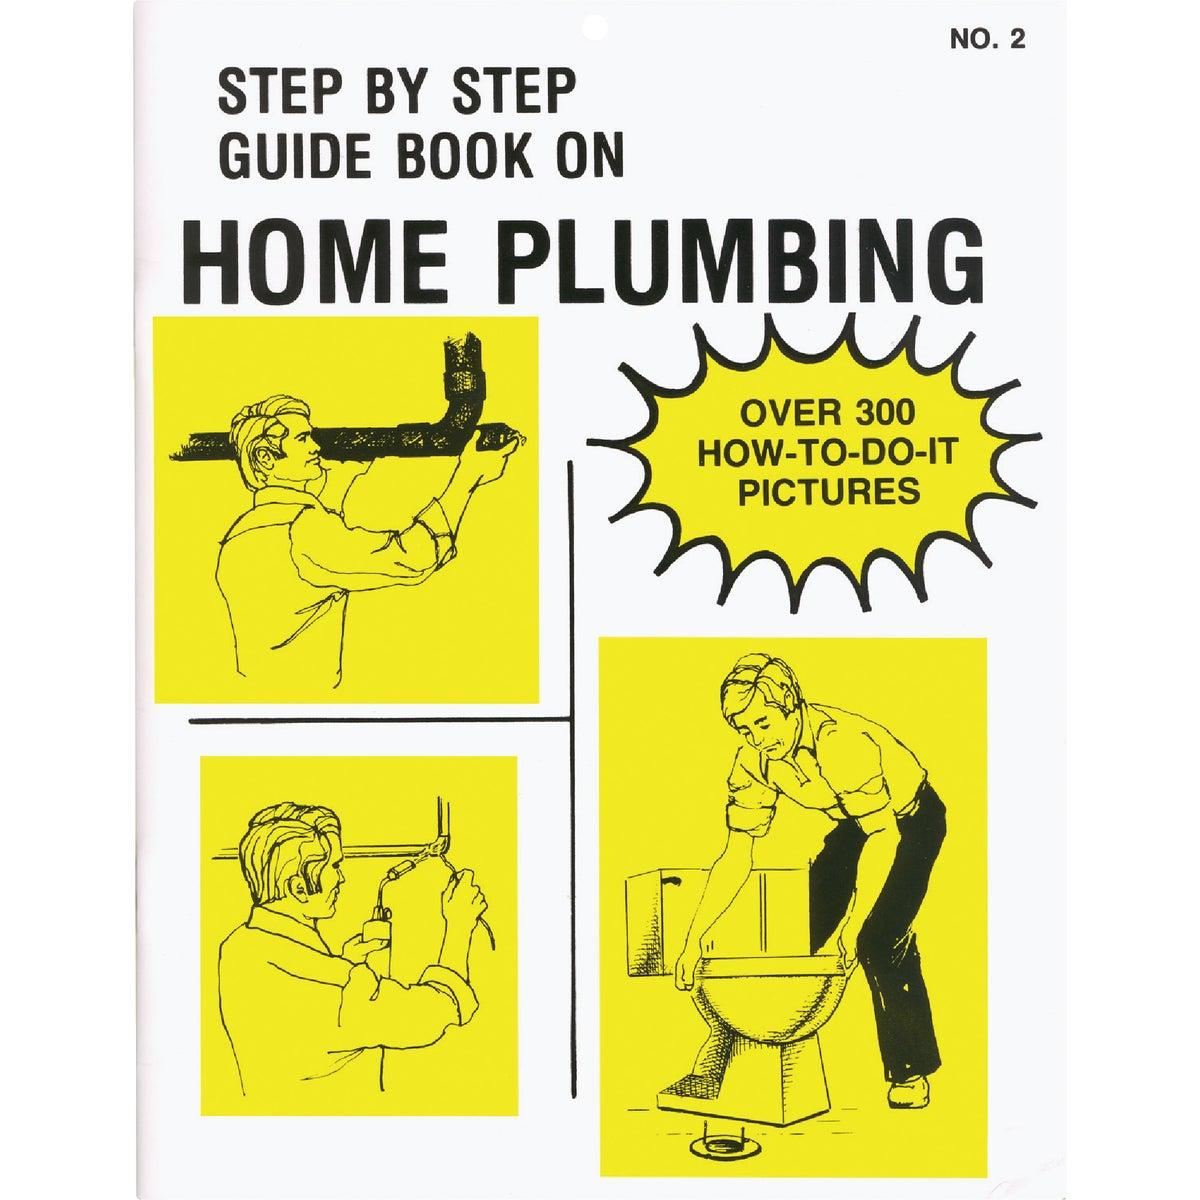 HOME PLUMBING BOOK